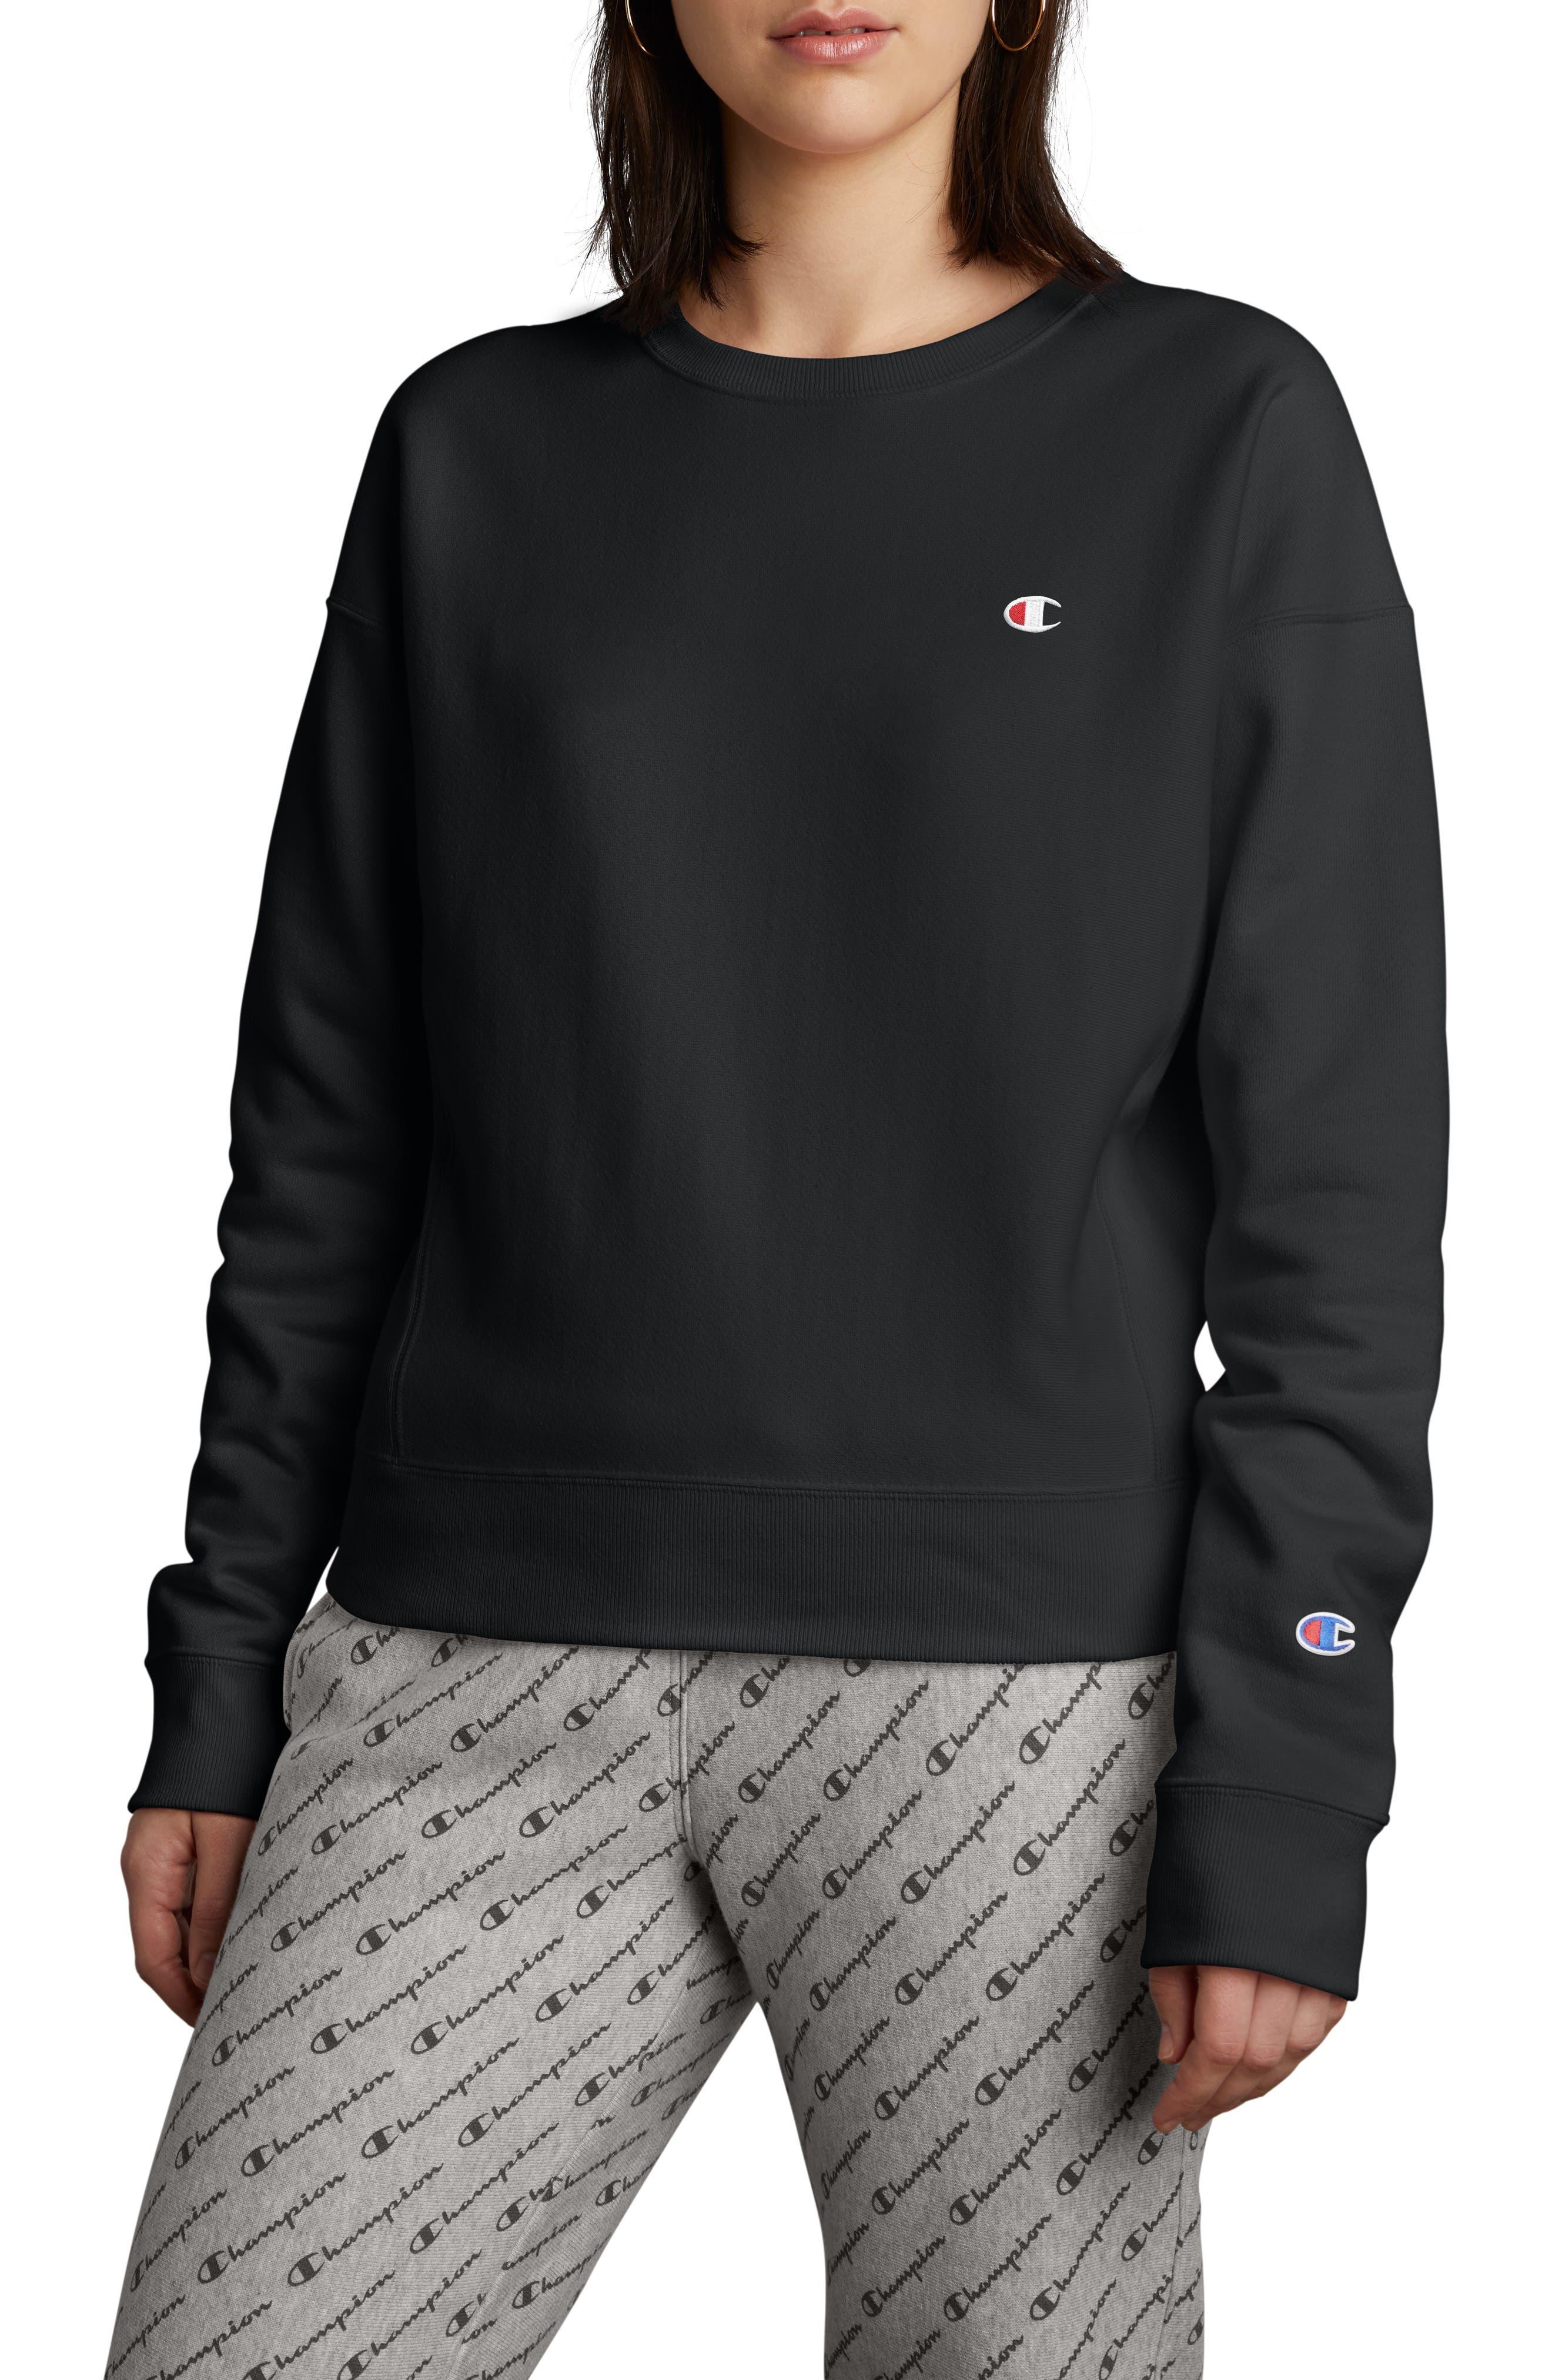 CHAMPION, Reverse Weave Sweatshirt, Main thumbnail 1, color, BLACK